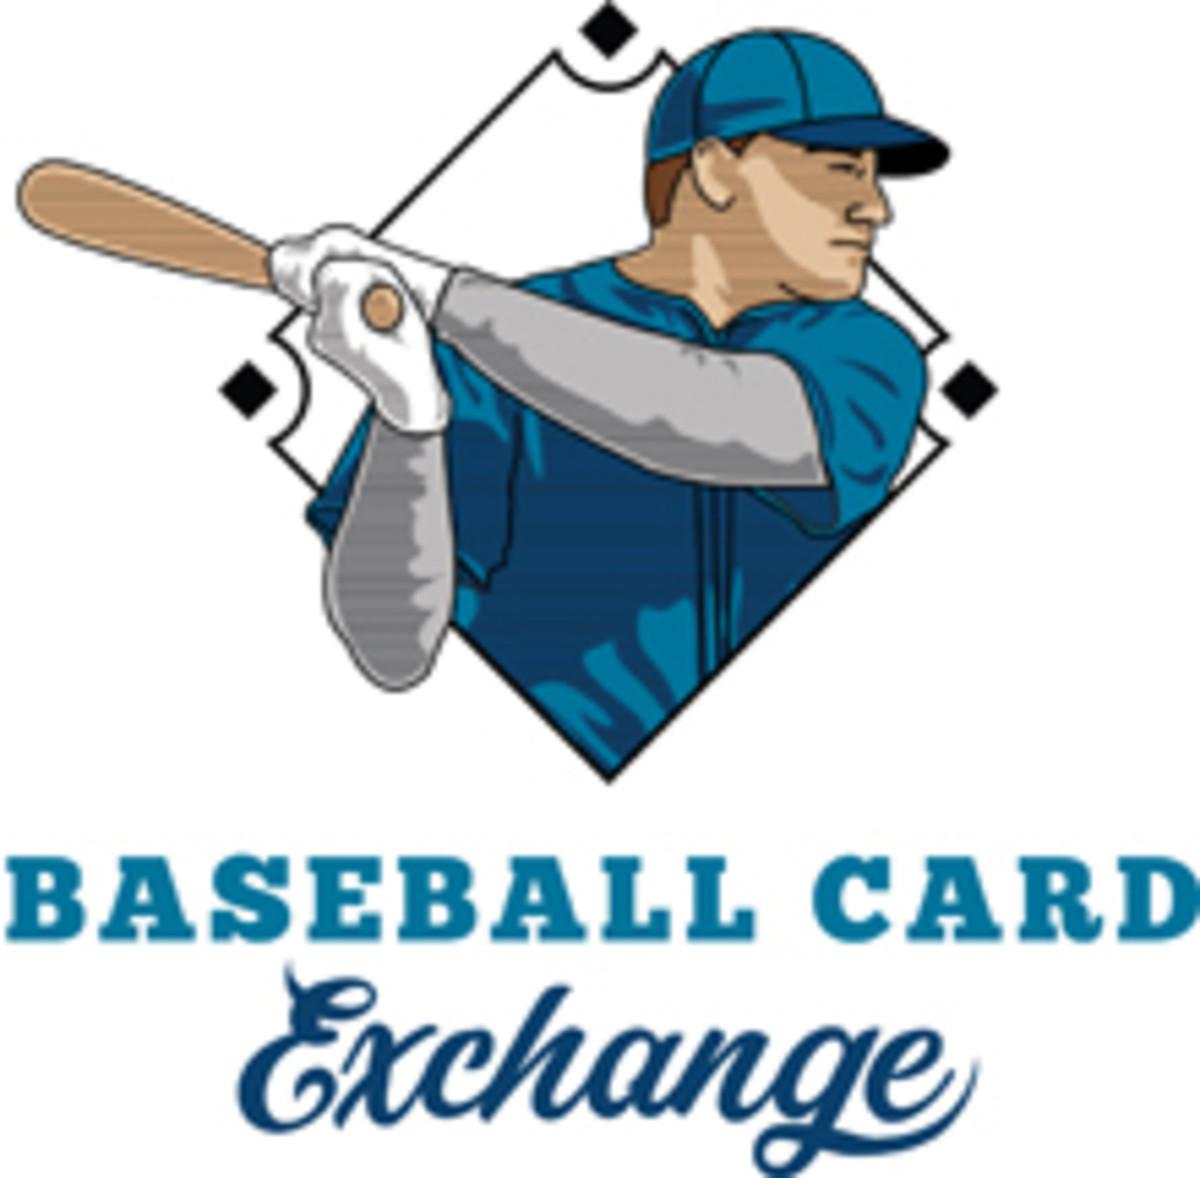 baseball card exchange logo